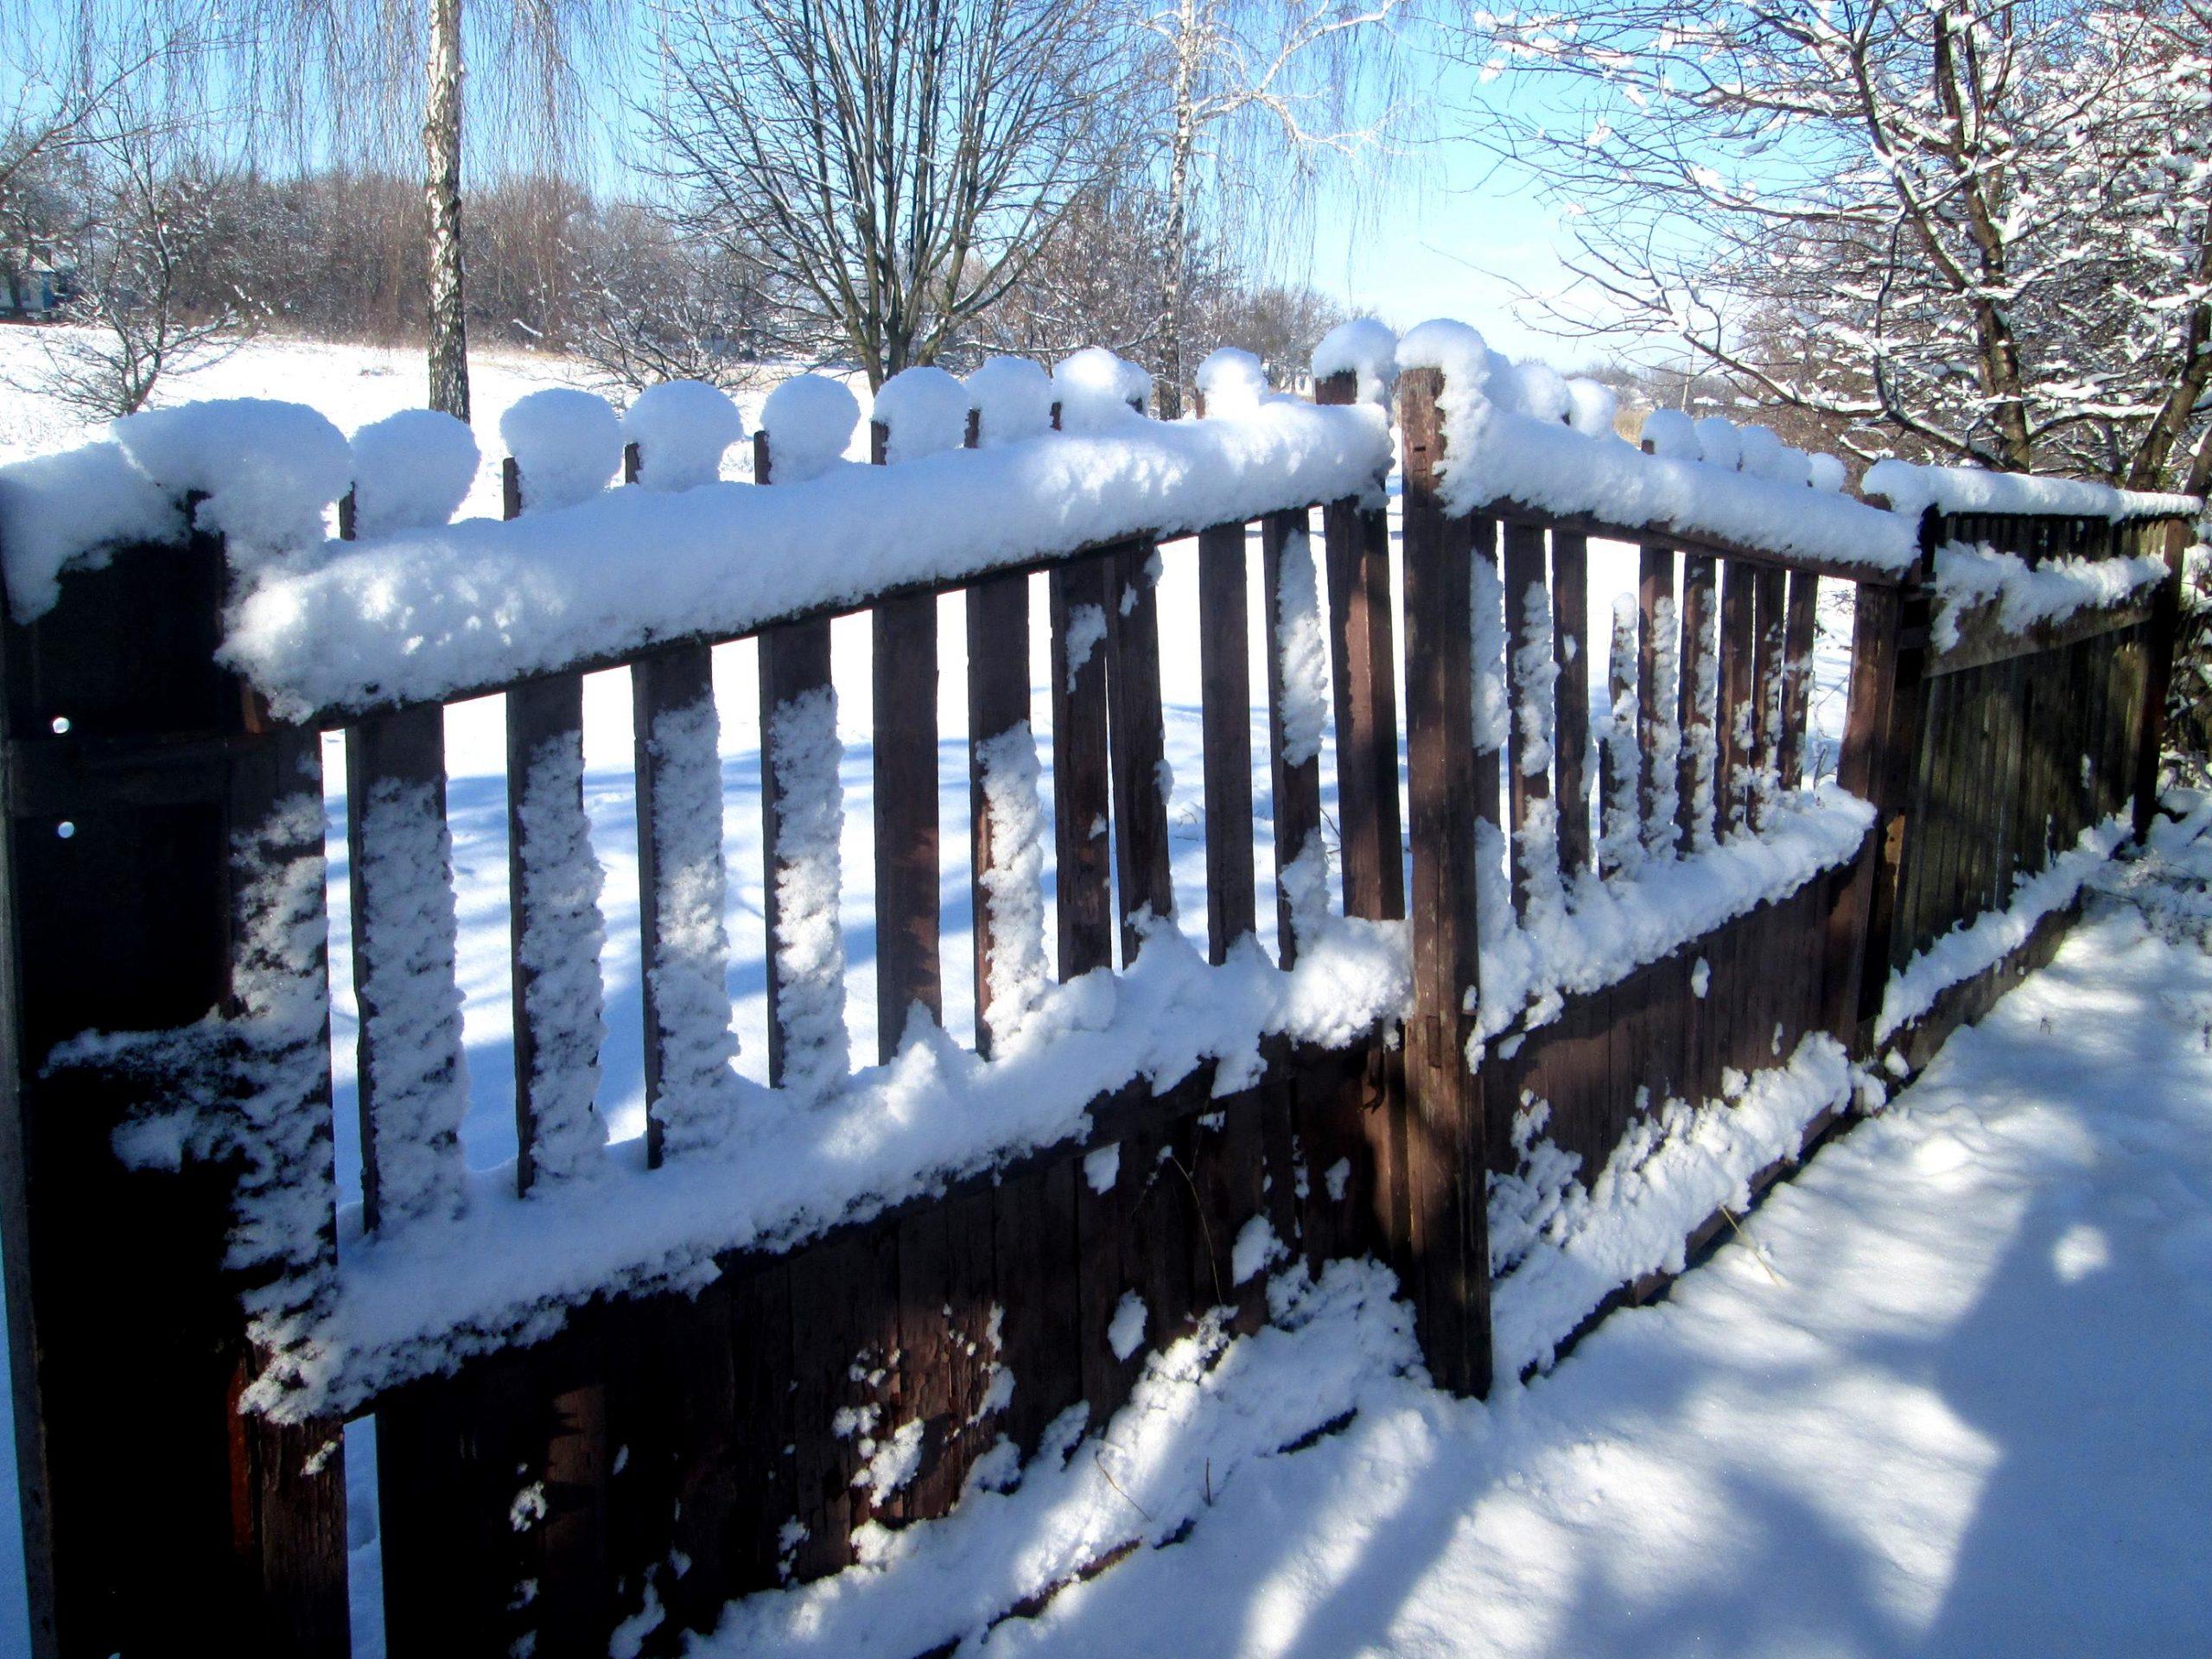 Snowfall photo